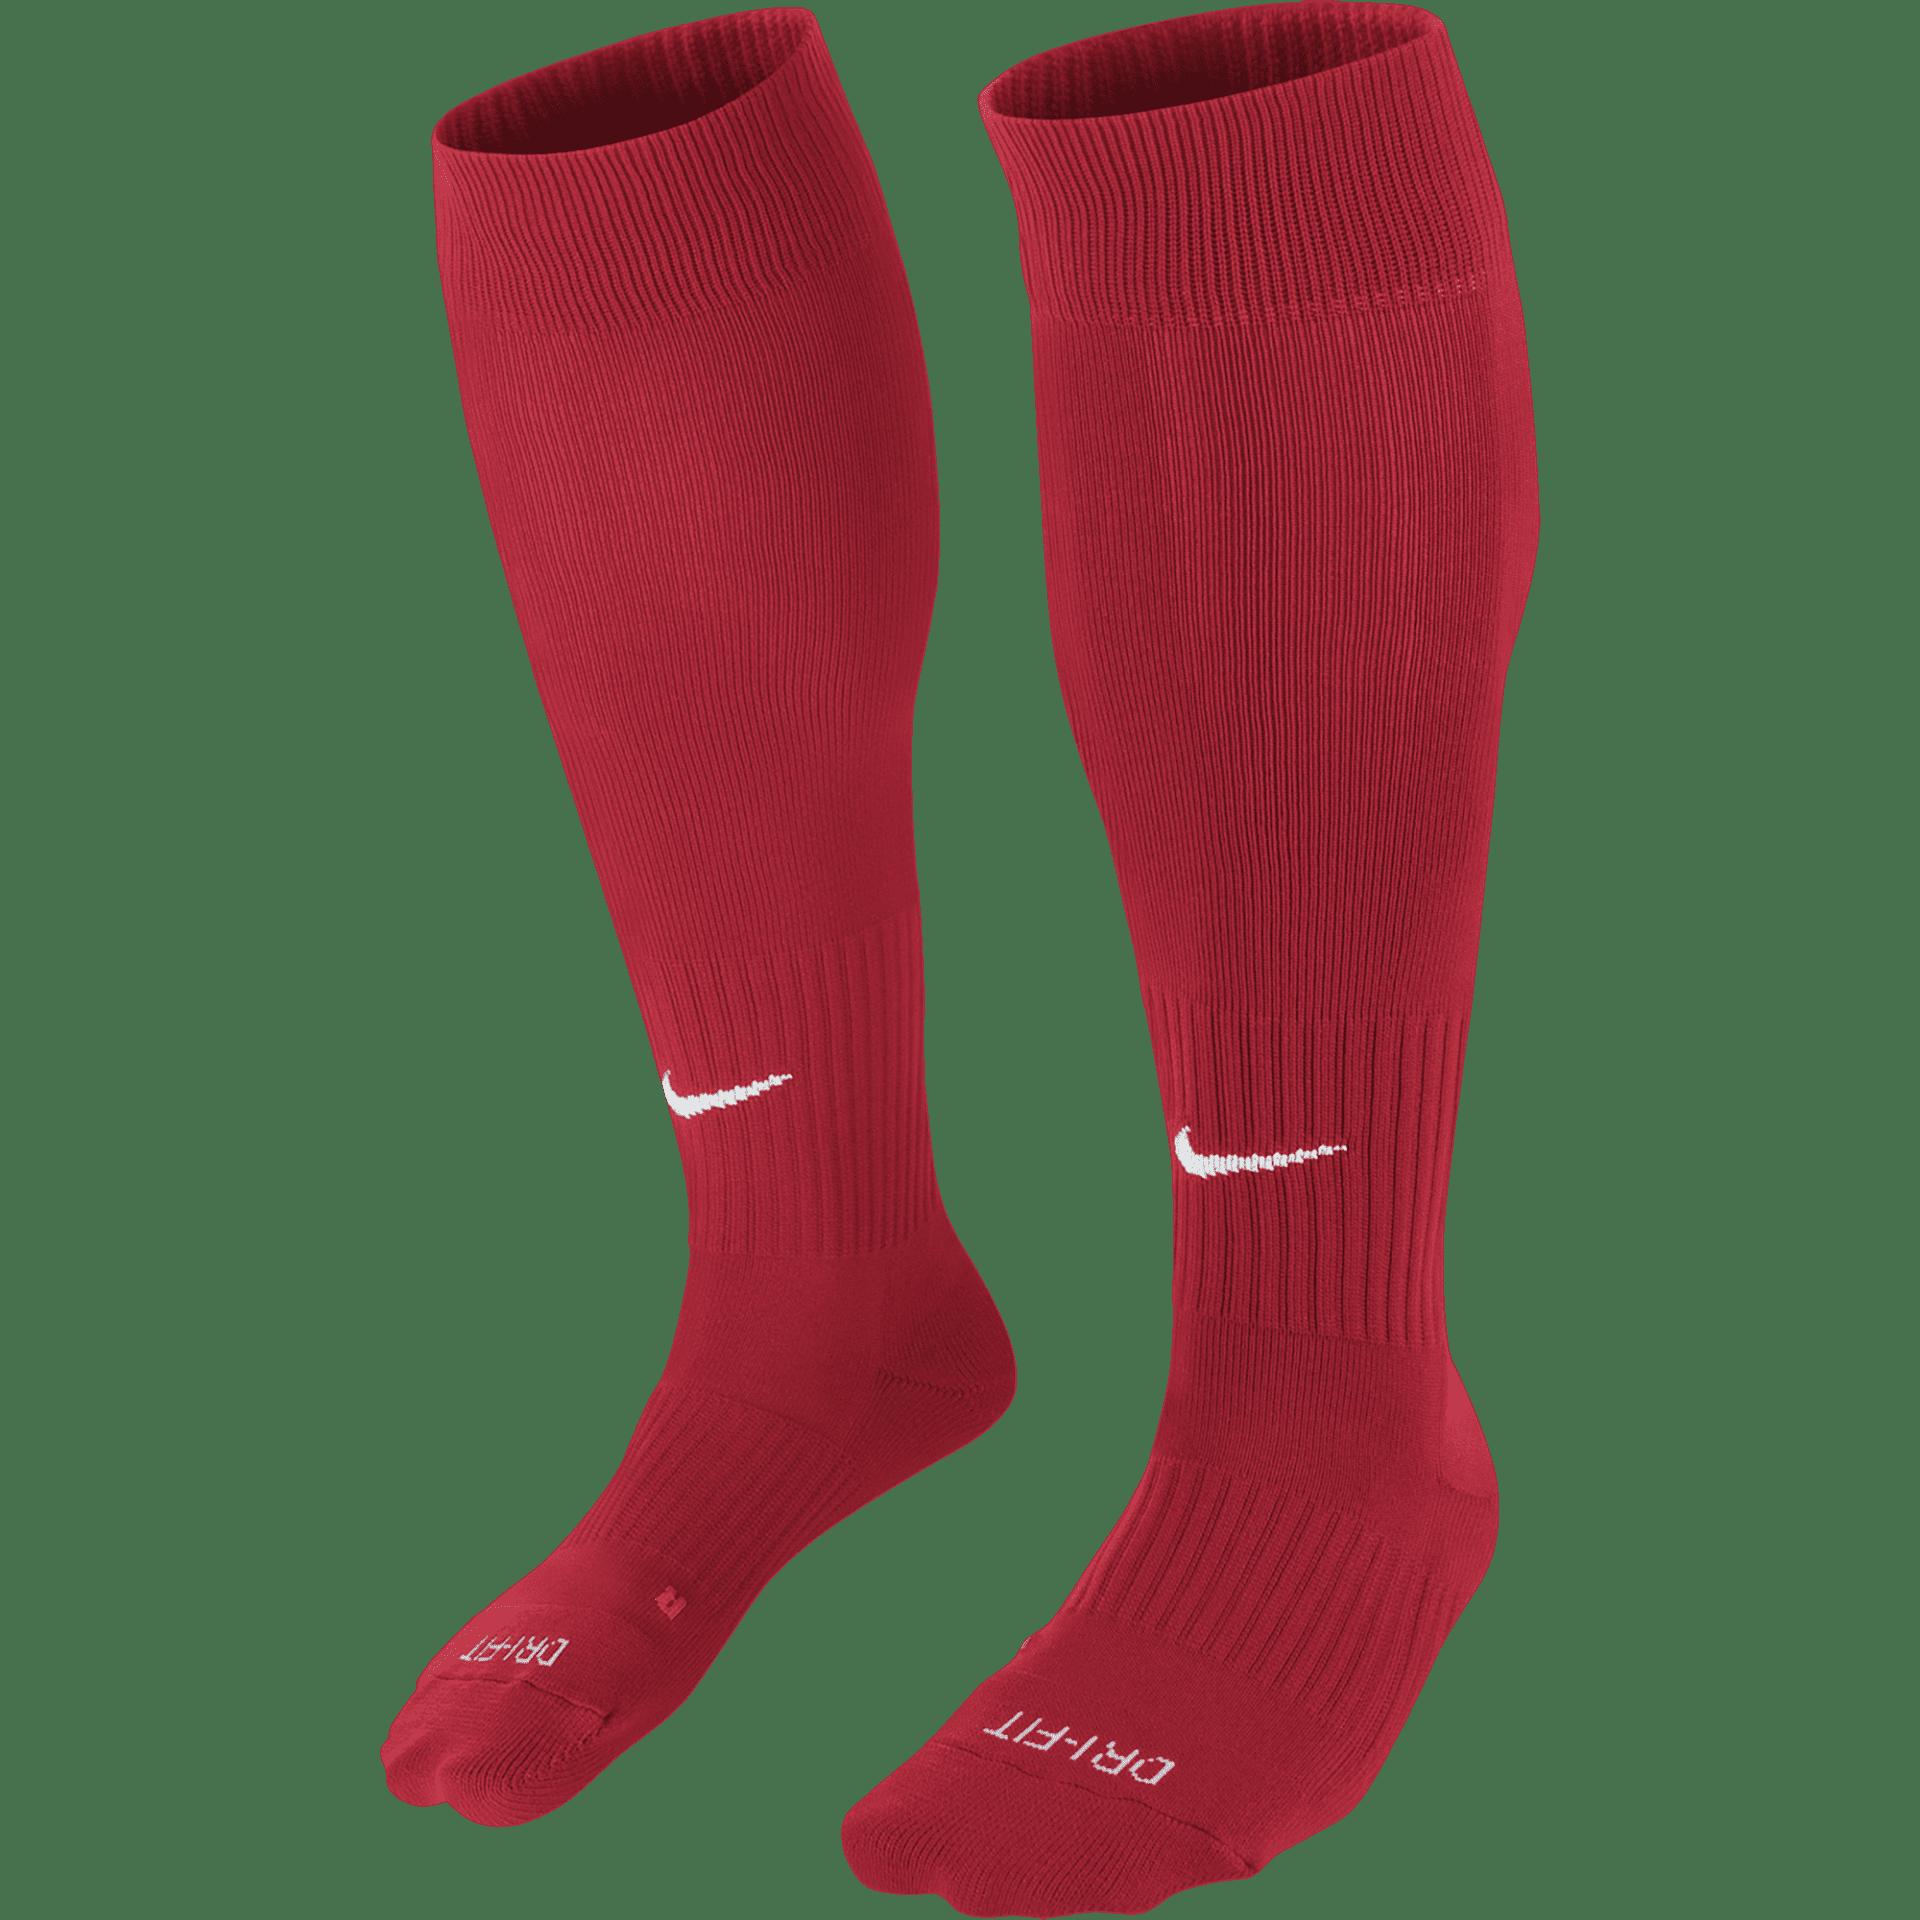 fivemiletown utd socks red  size 8 12 34381 p